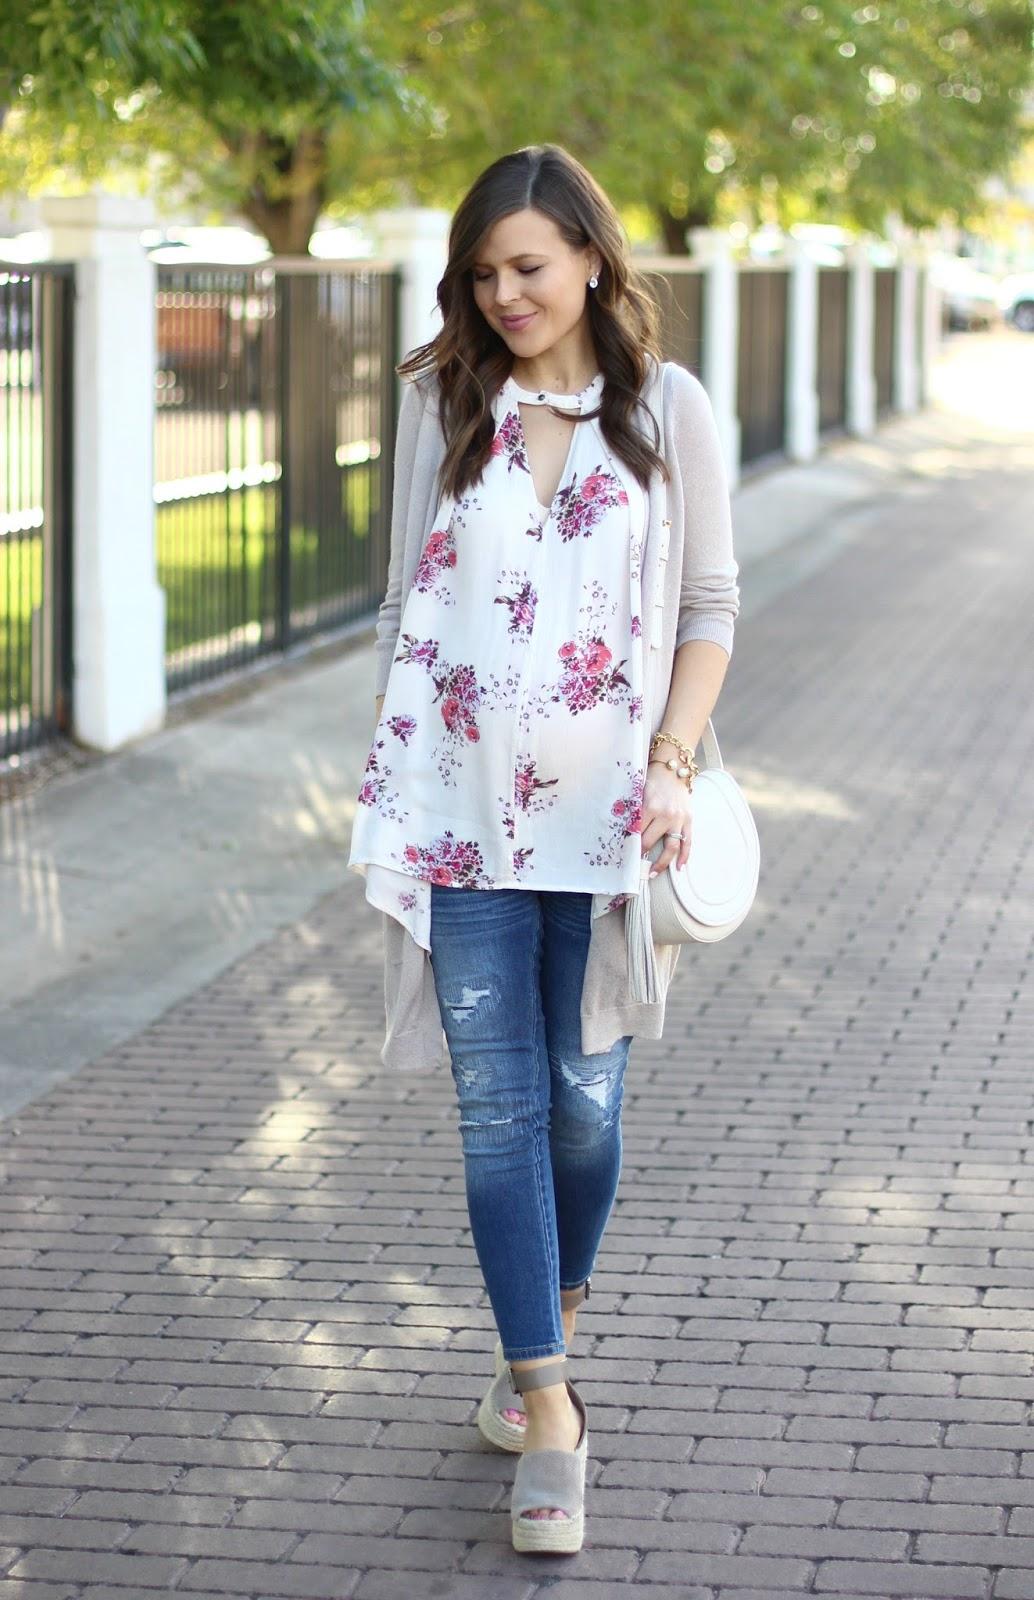 Floral Tunic & Neutrals